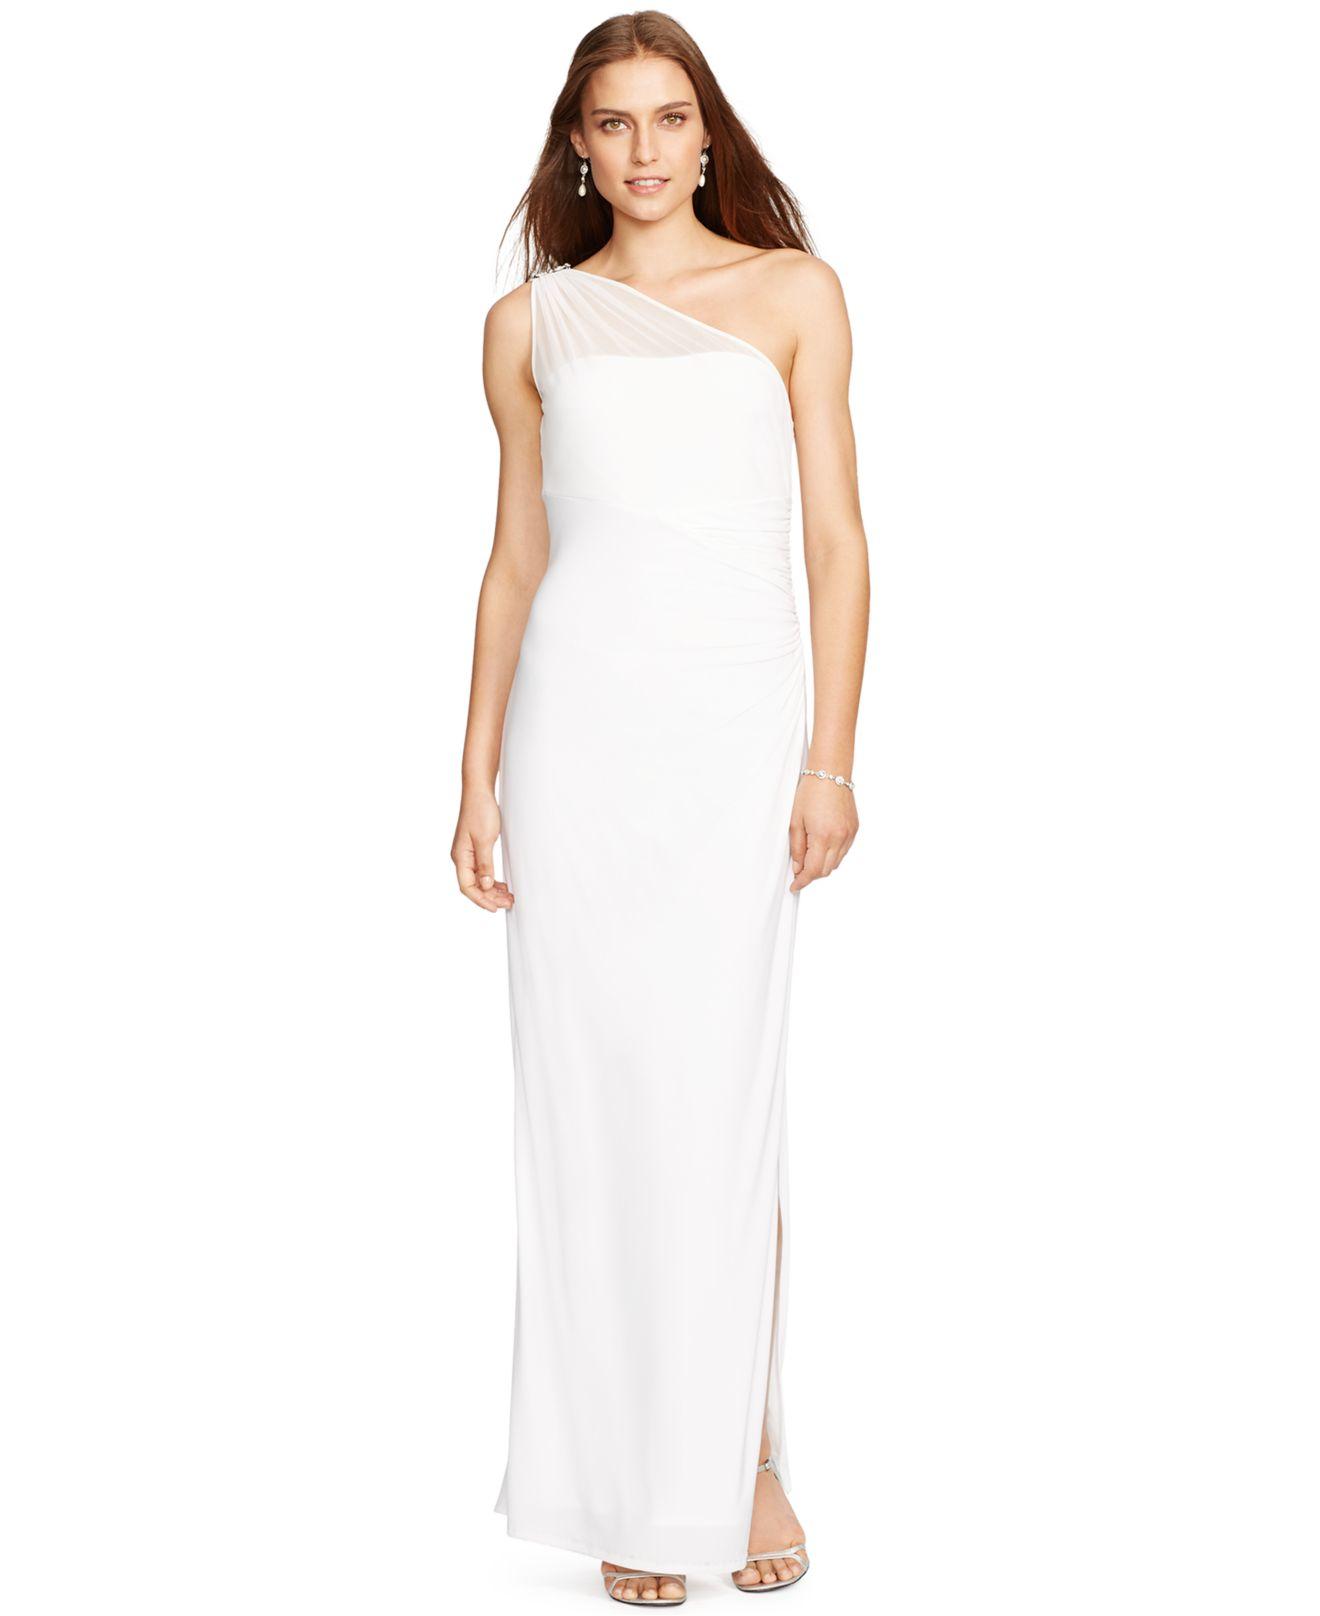 a70550d52d Lauren by Ralph Lauren One-Shoulder Illusion Gown in Natural - Lyst